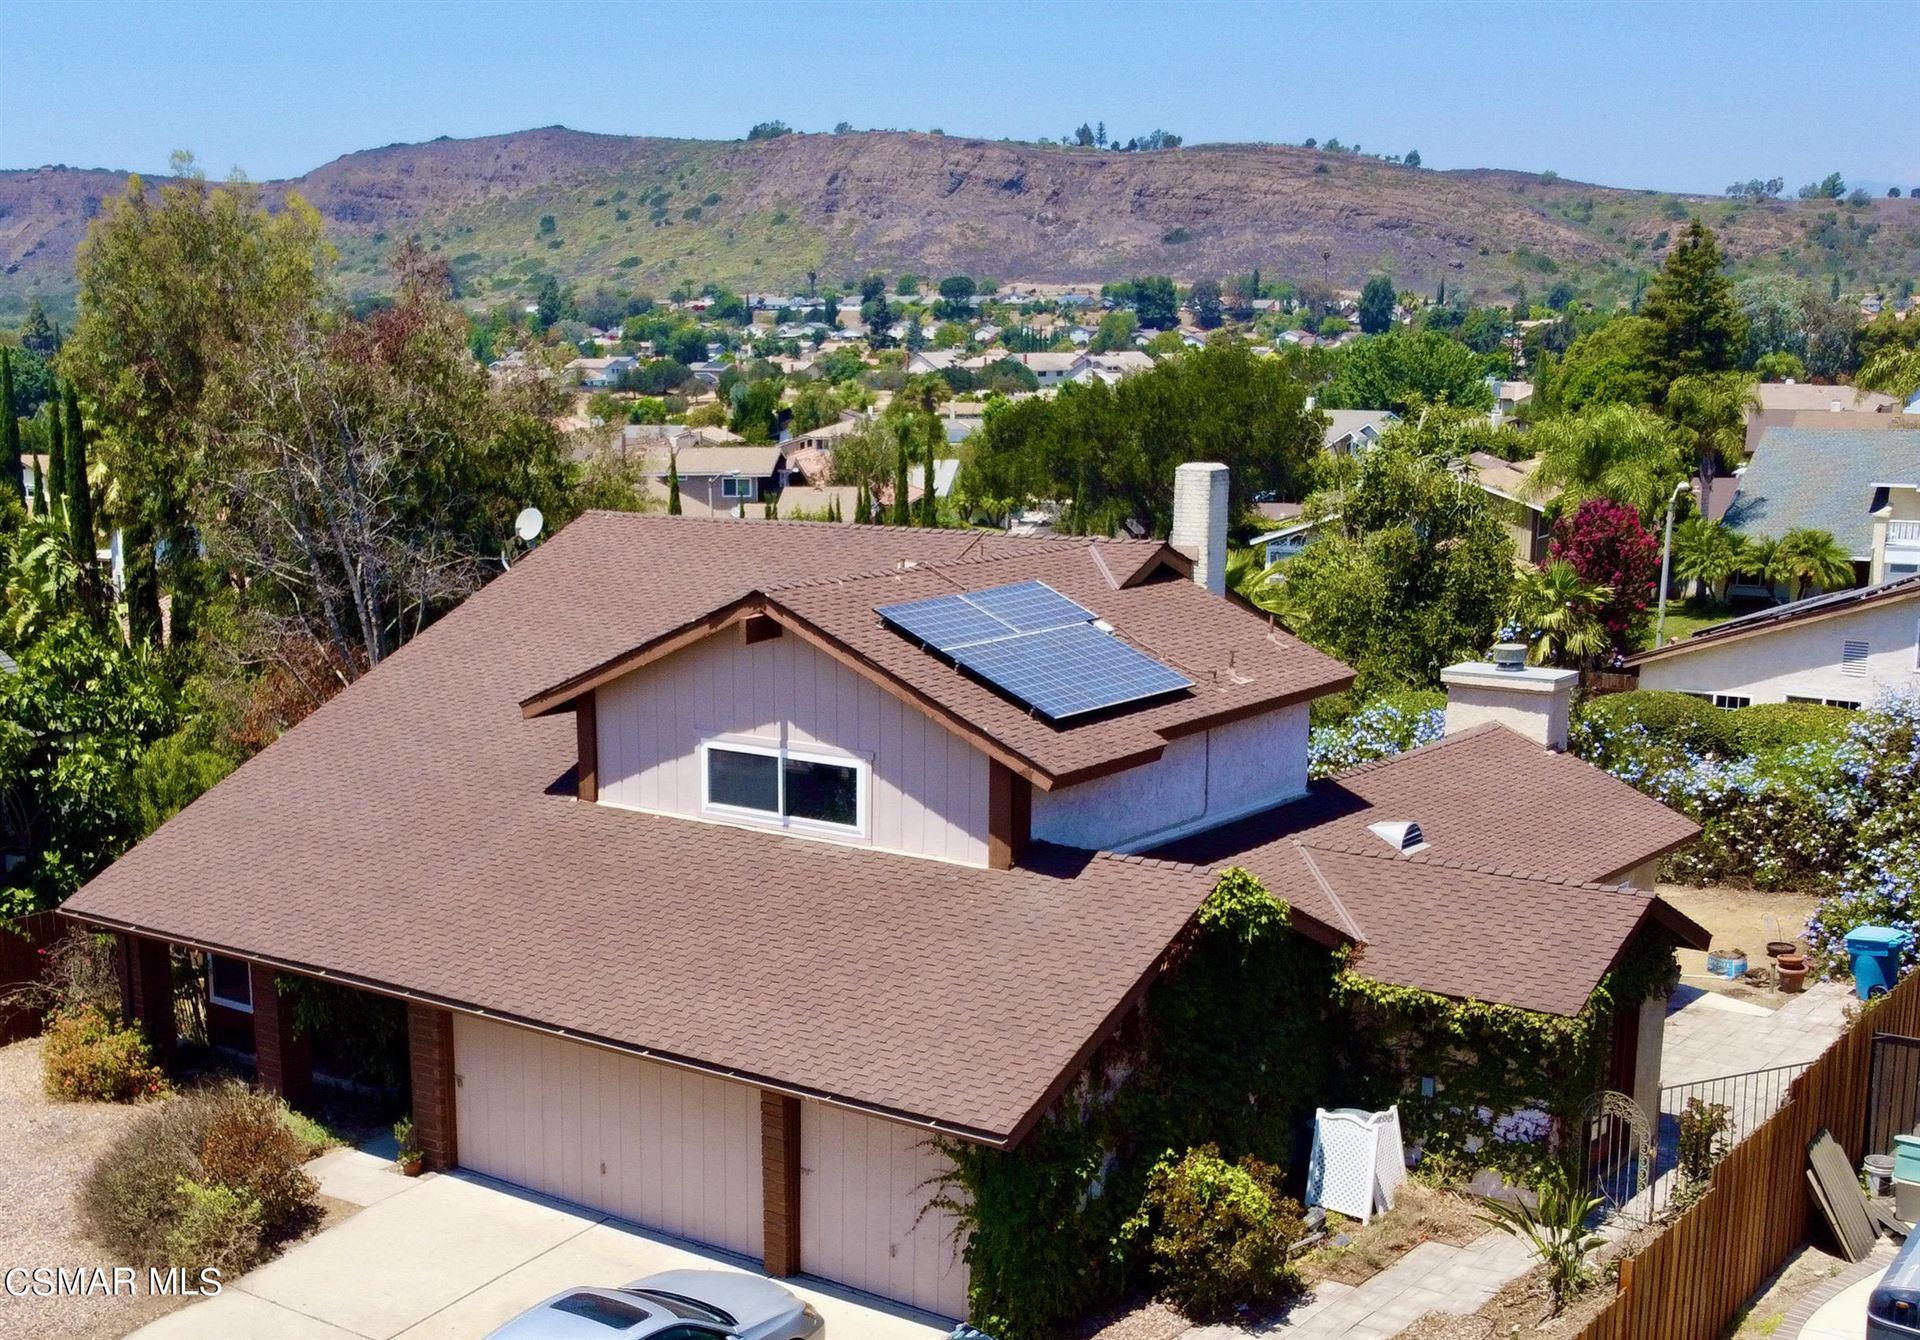 497 Azalea Street, Thousand Oaks, CA 91360 - MLS#: 221004154